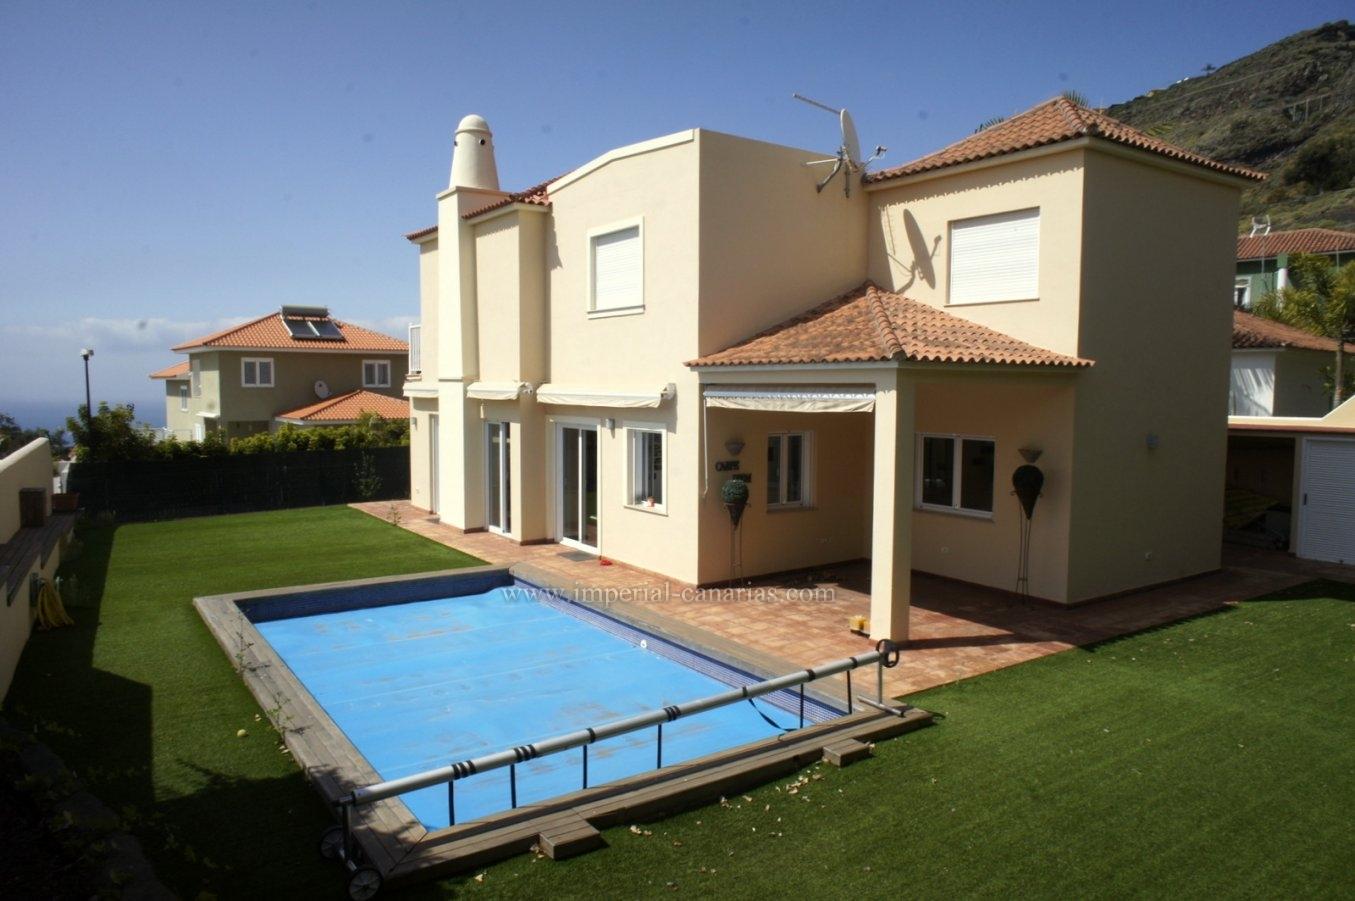 Fantastic villa with swimming pool and views, next to Puerto de la Cruz!